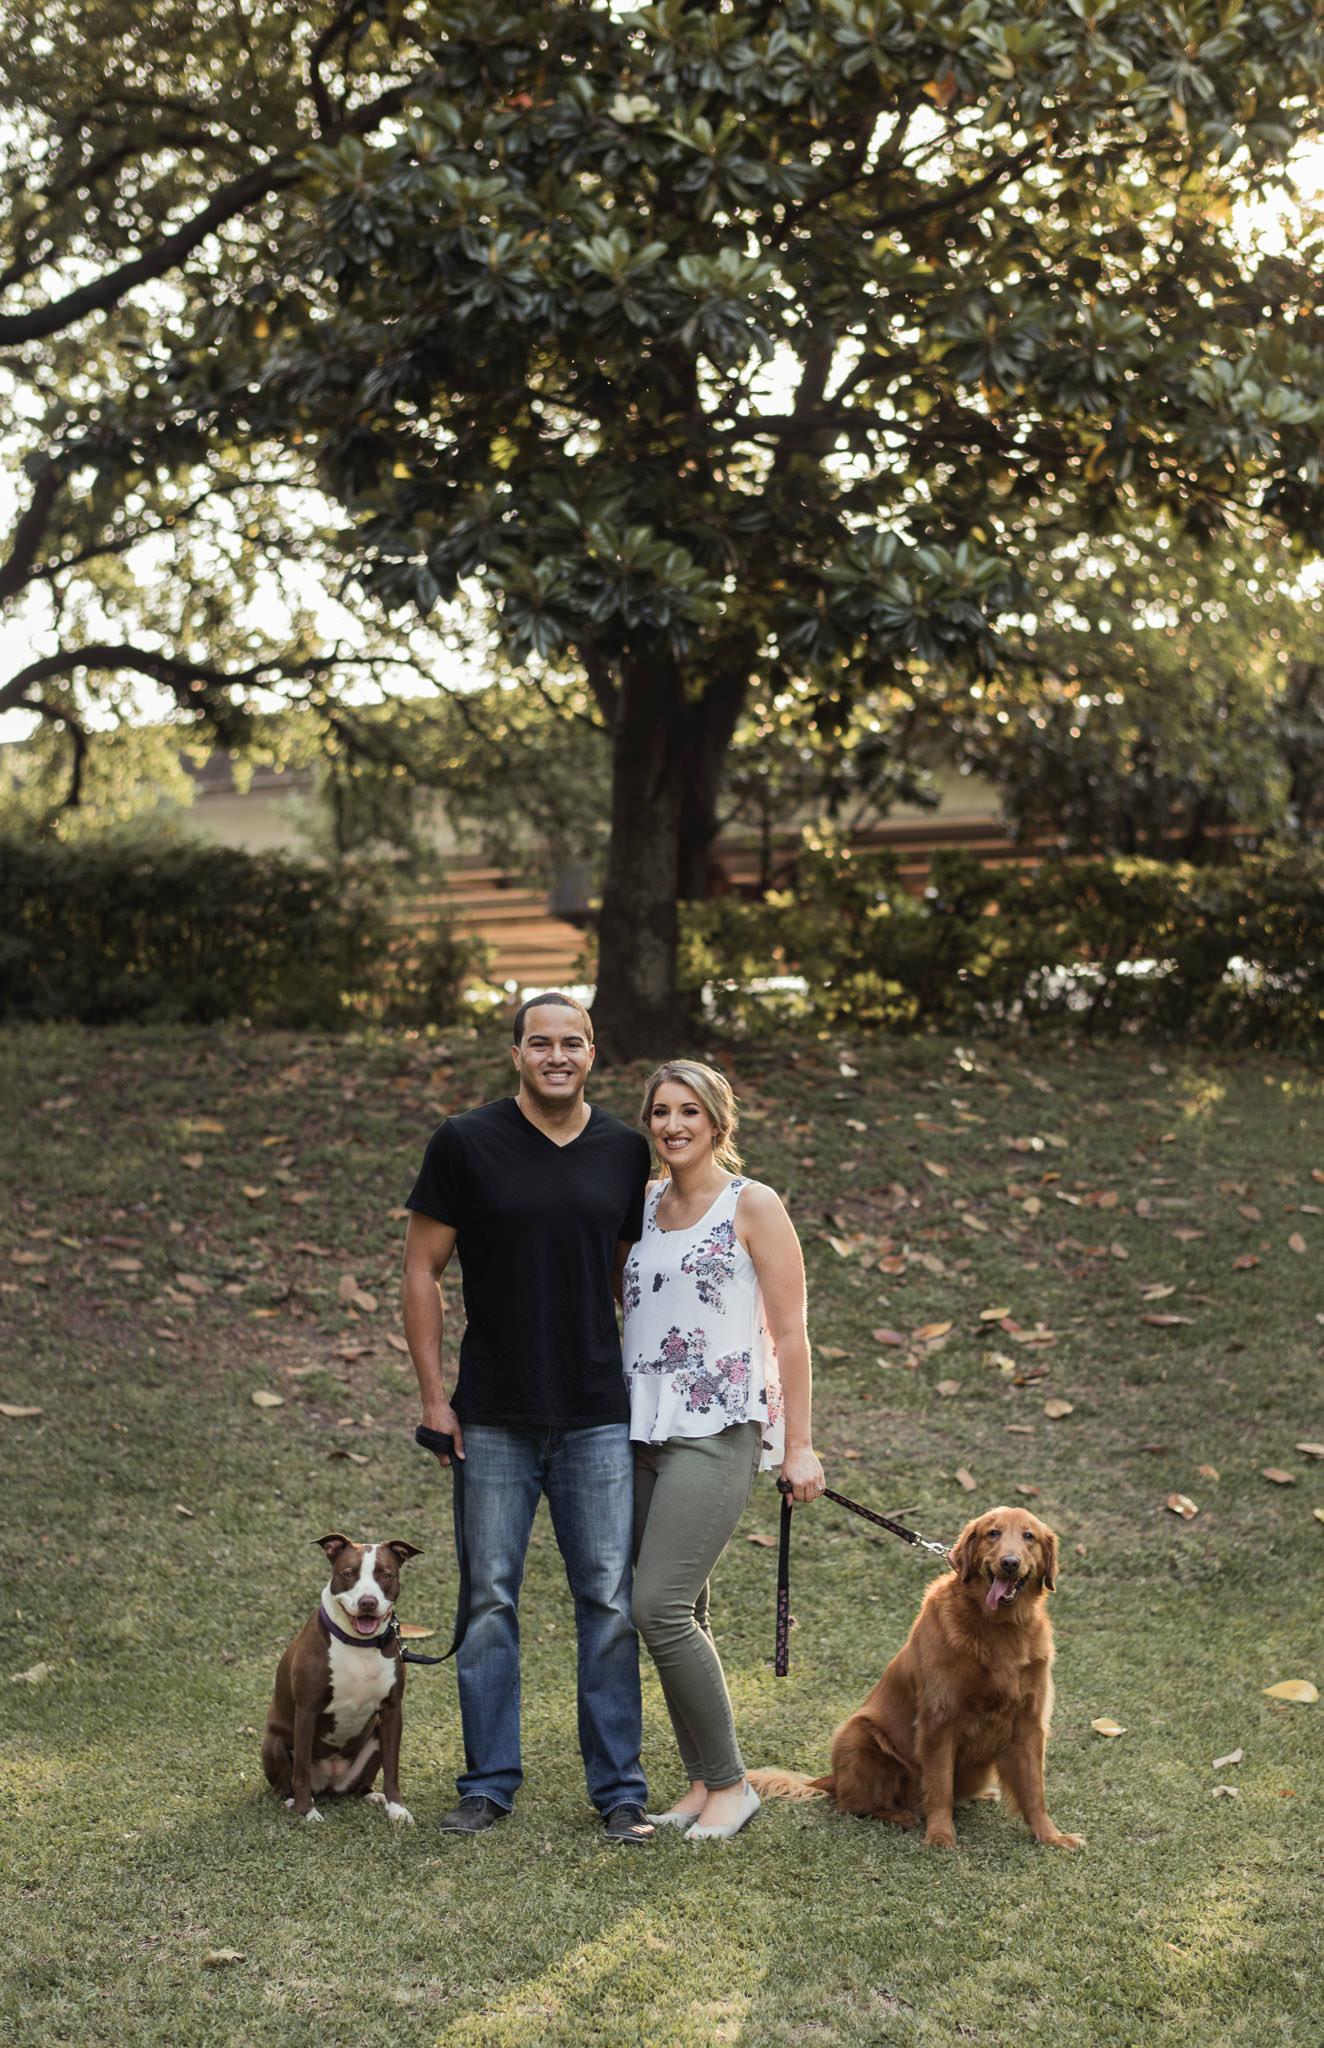 Sam-Houston-Park-Engagement-photographer